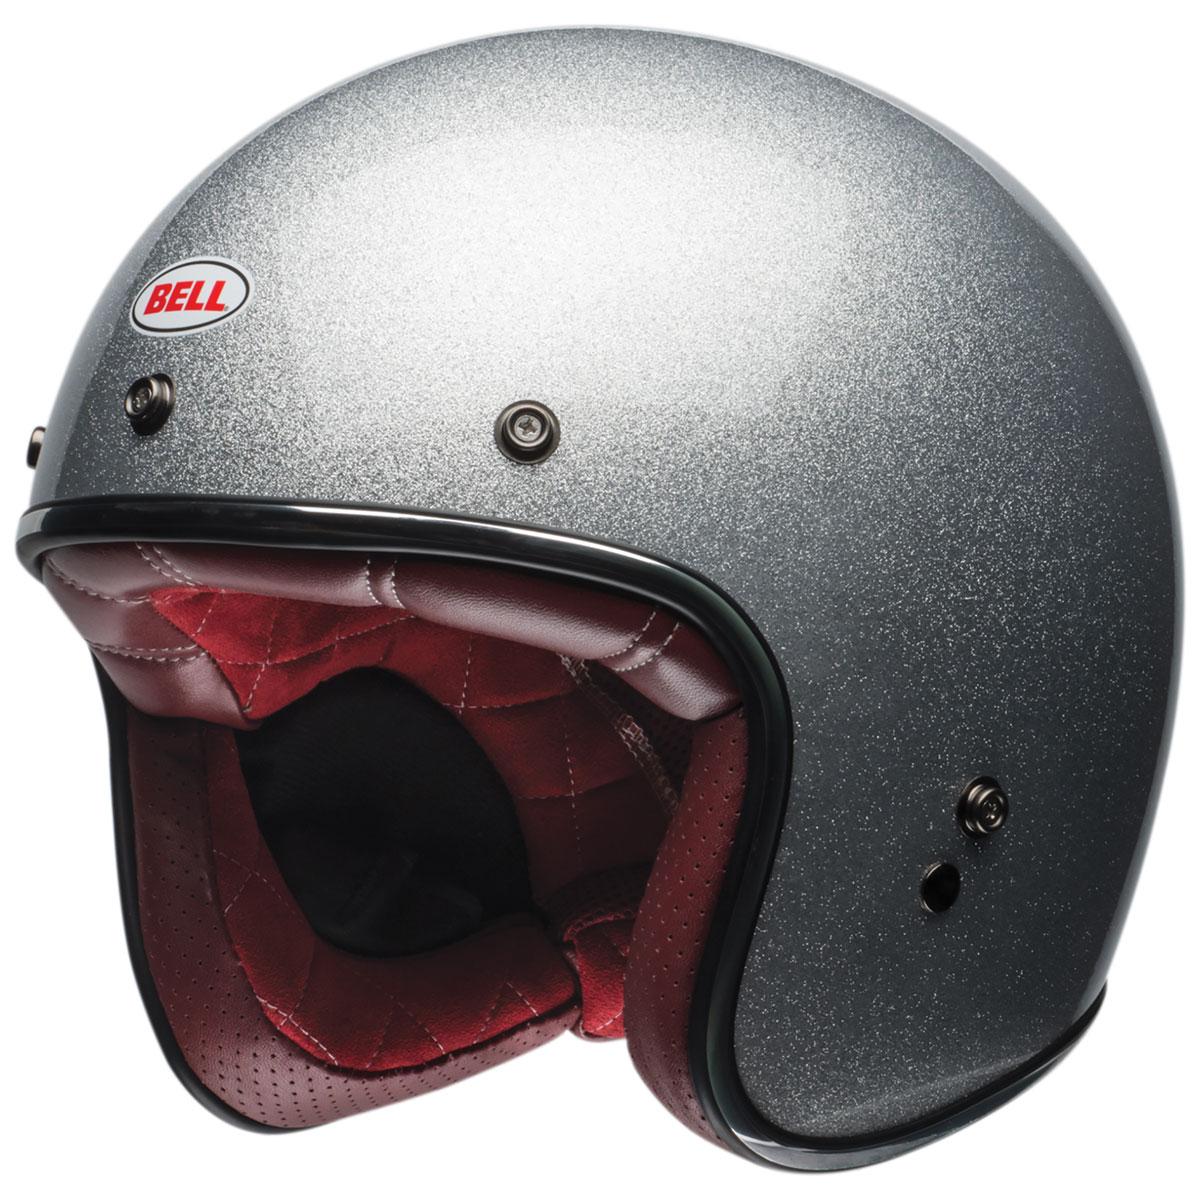 Bell Motorcycle Helmet >> Bell Custom 500 Gloss Silver Flake Open Face Helmet 7092618